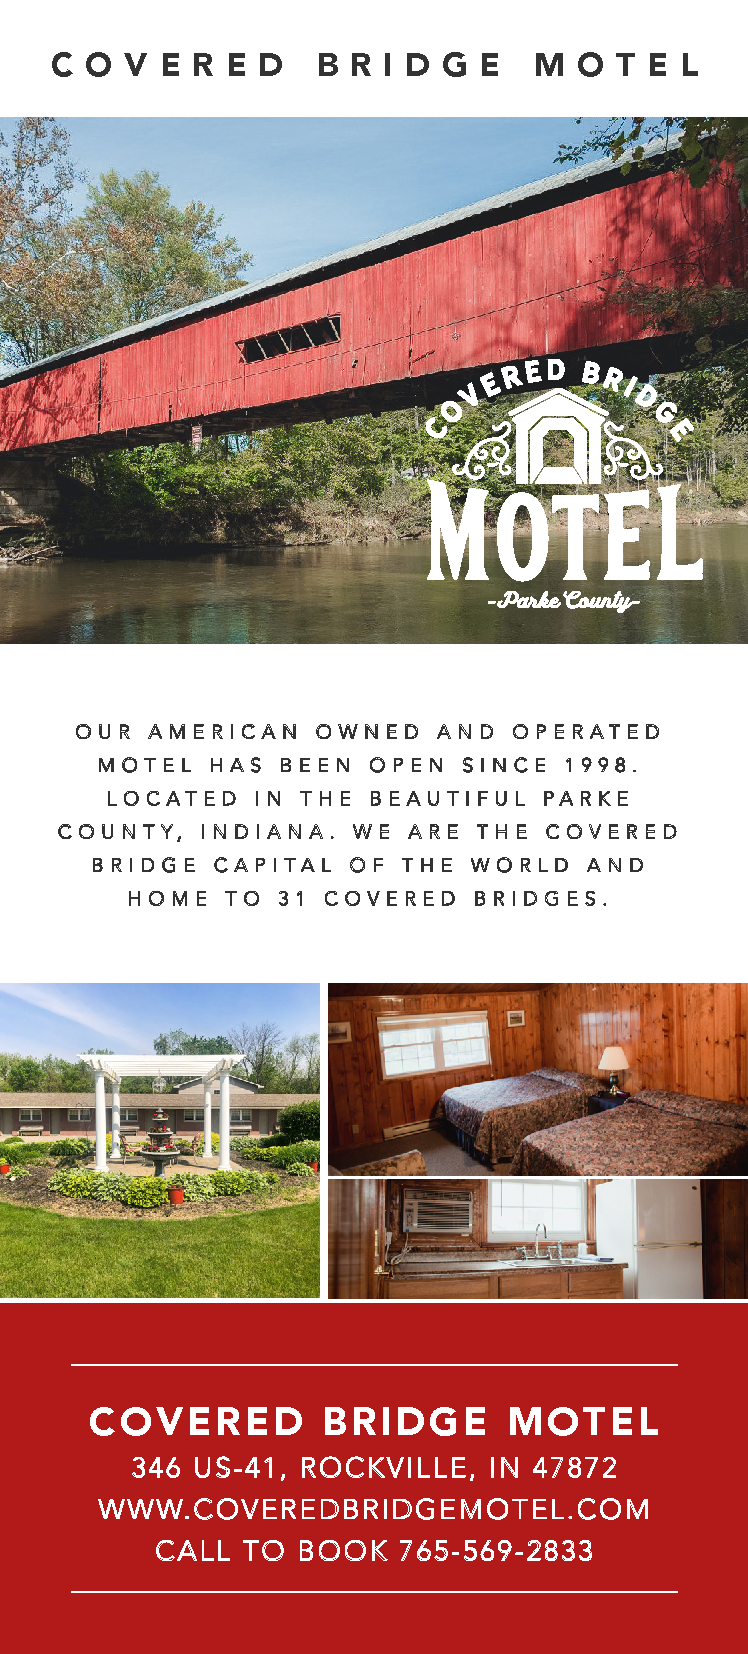 Rack Card Covered Bridge Motel